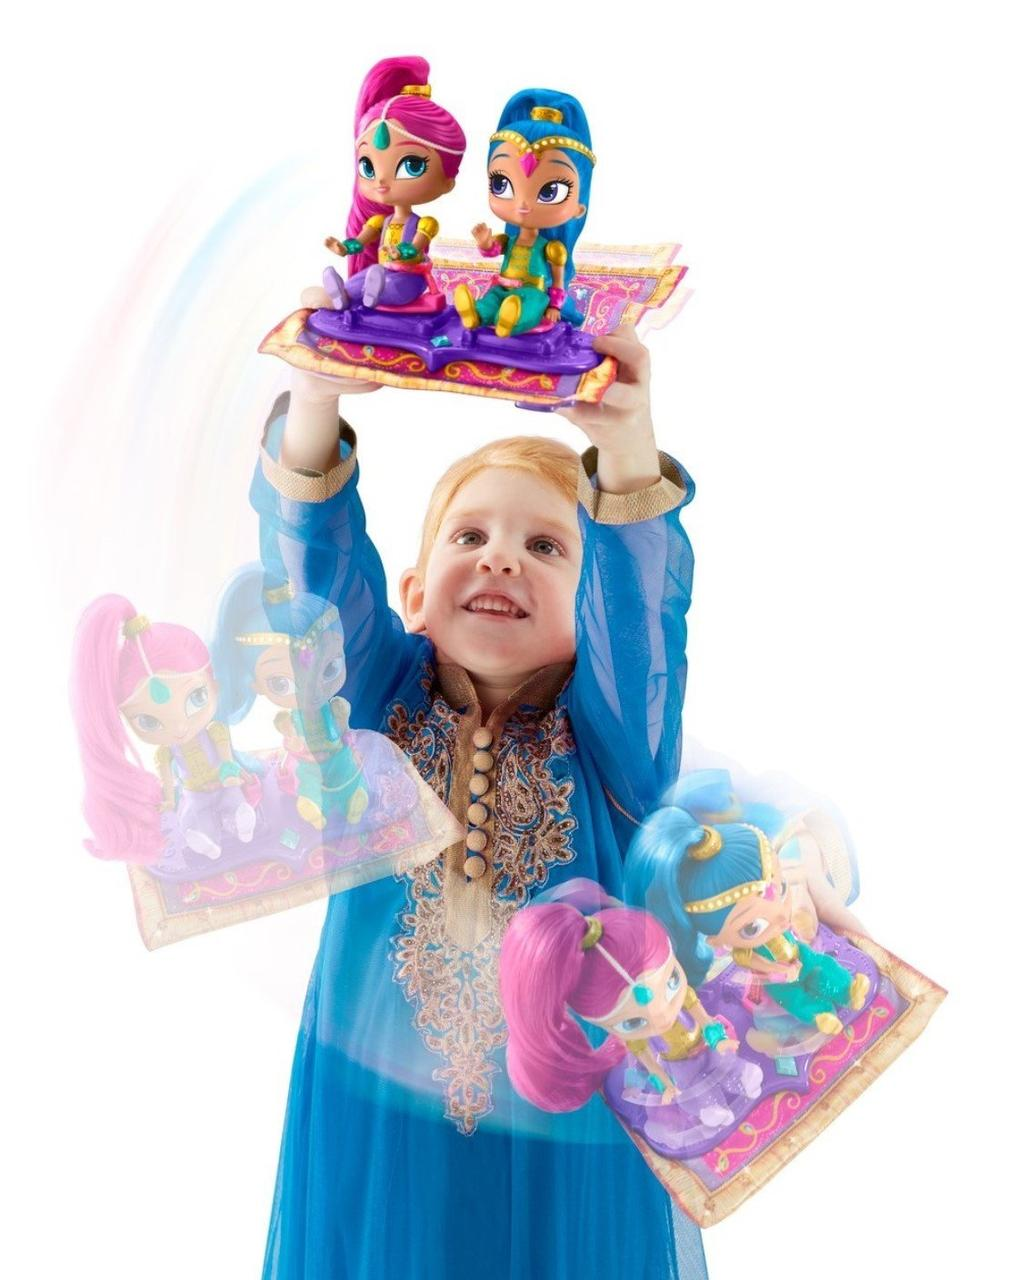 Fisher-Price Шиммер и Шайн Магический Ковер-Самолет Nickelodeon Shimmer & Shine, Magic Flying Carpet Fisher-Price 07480, фото 1